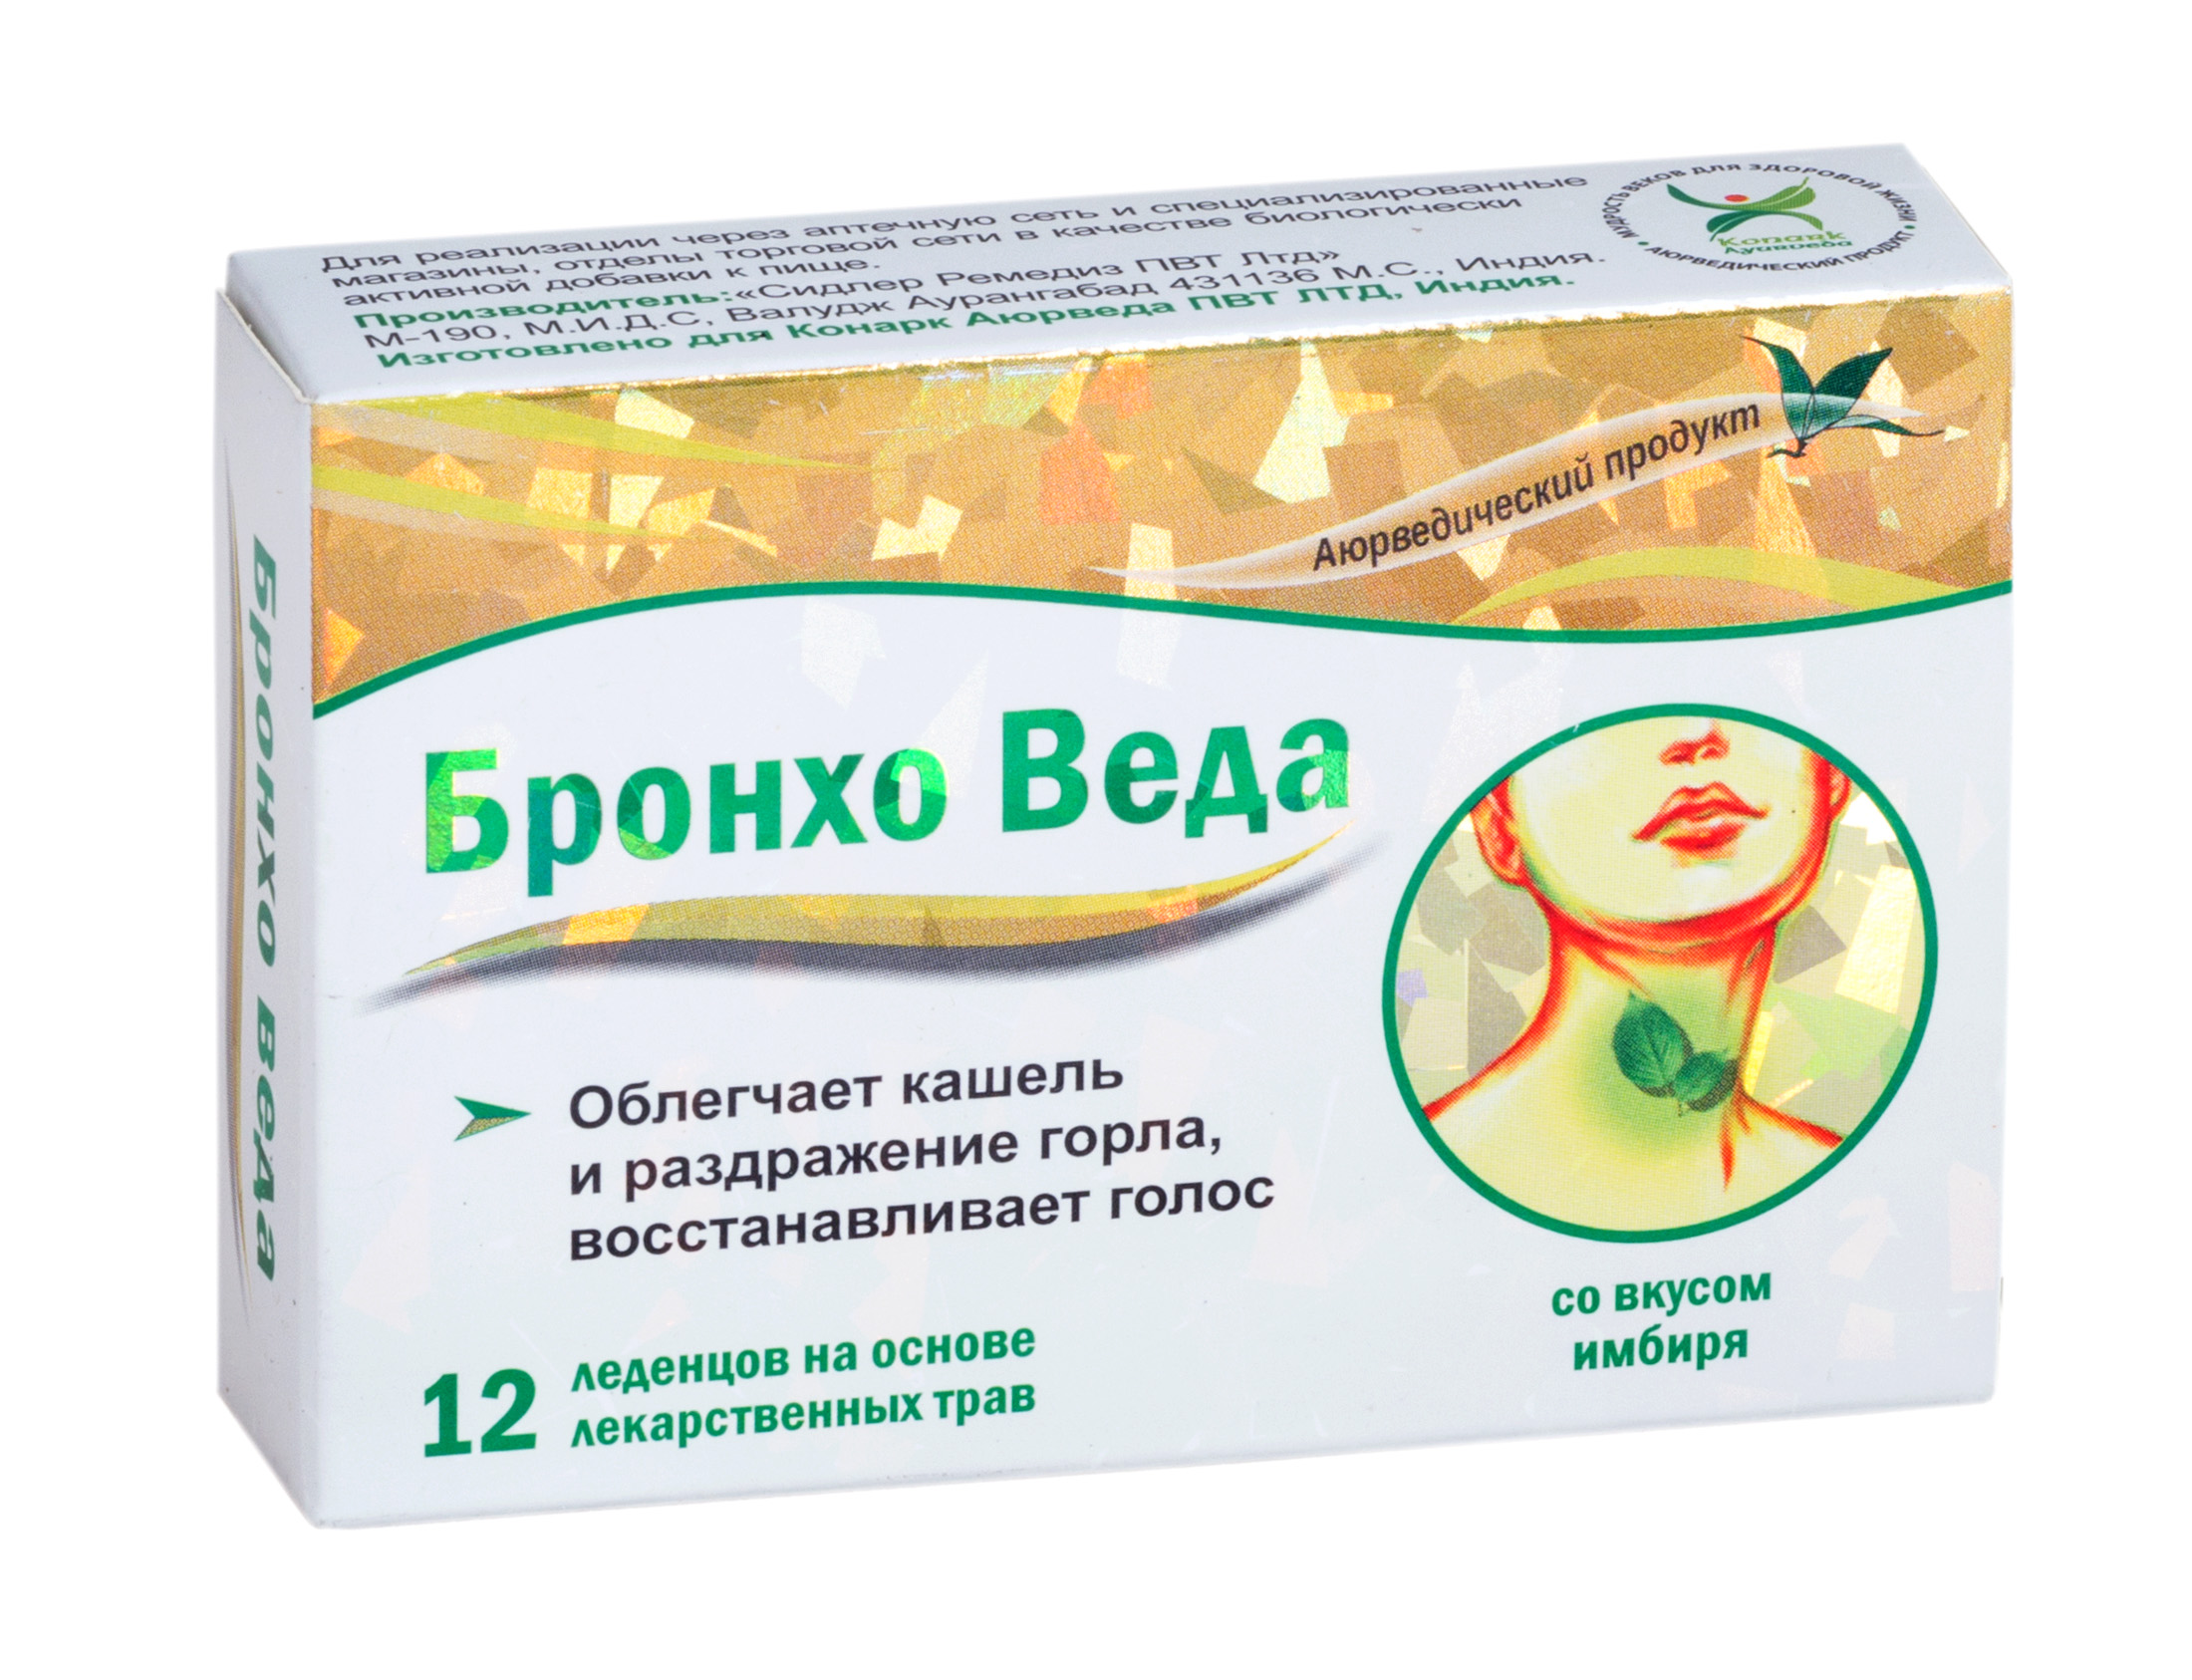 Бронхо веда леденцы травяные №12 (со вкусом имбиря)